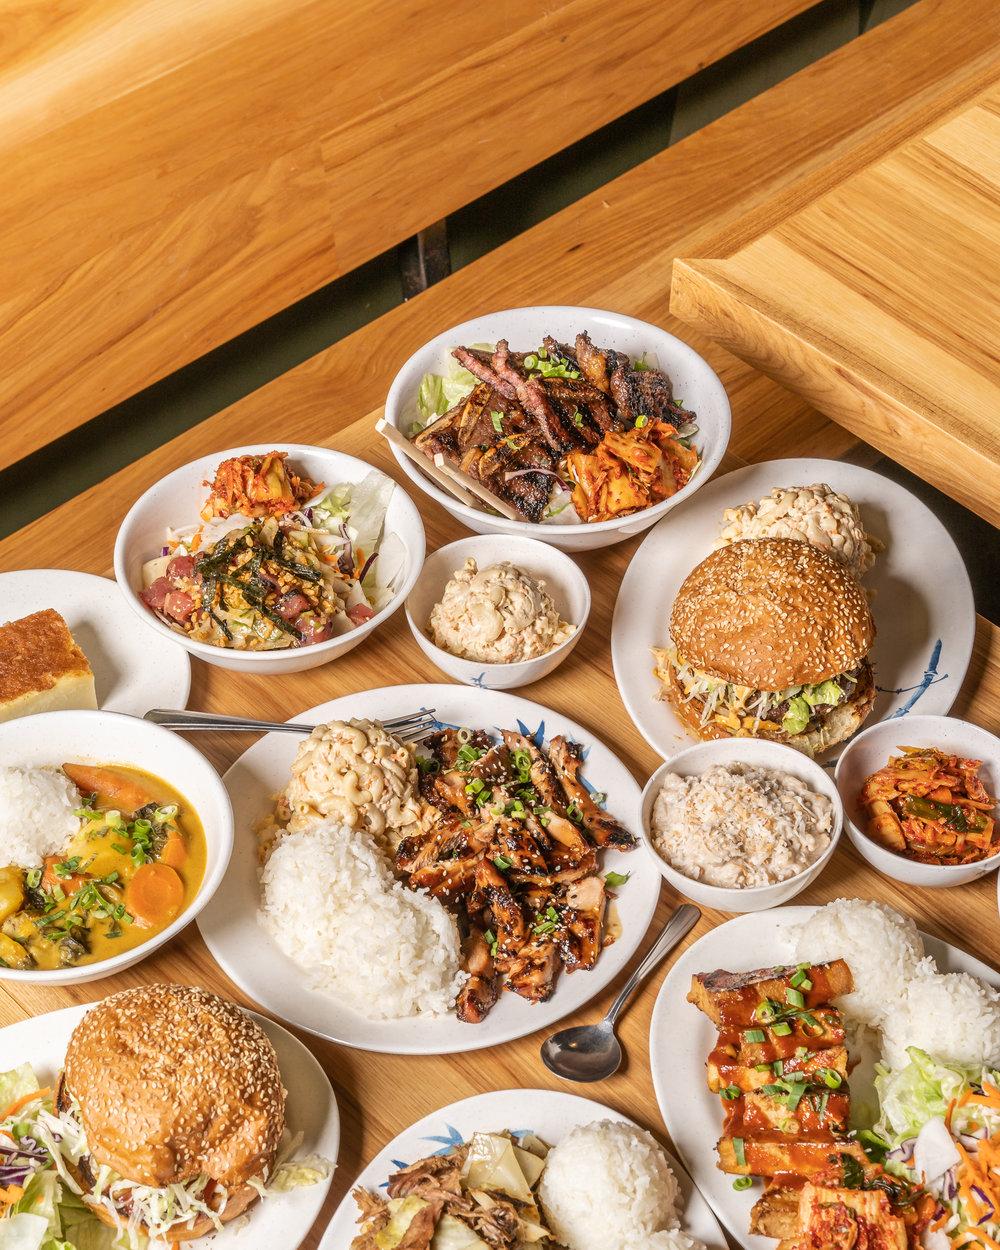 hawaiian food portland food photography jeremy pawlowski canyon creative company for hire.jpg